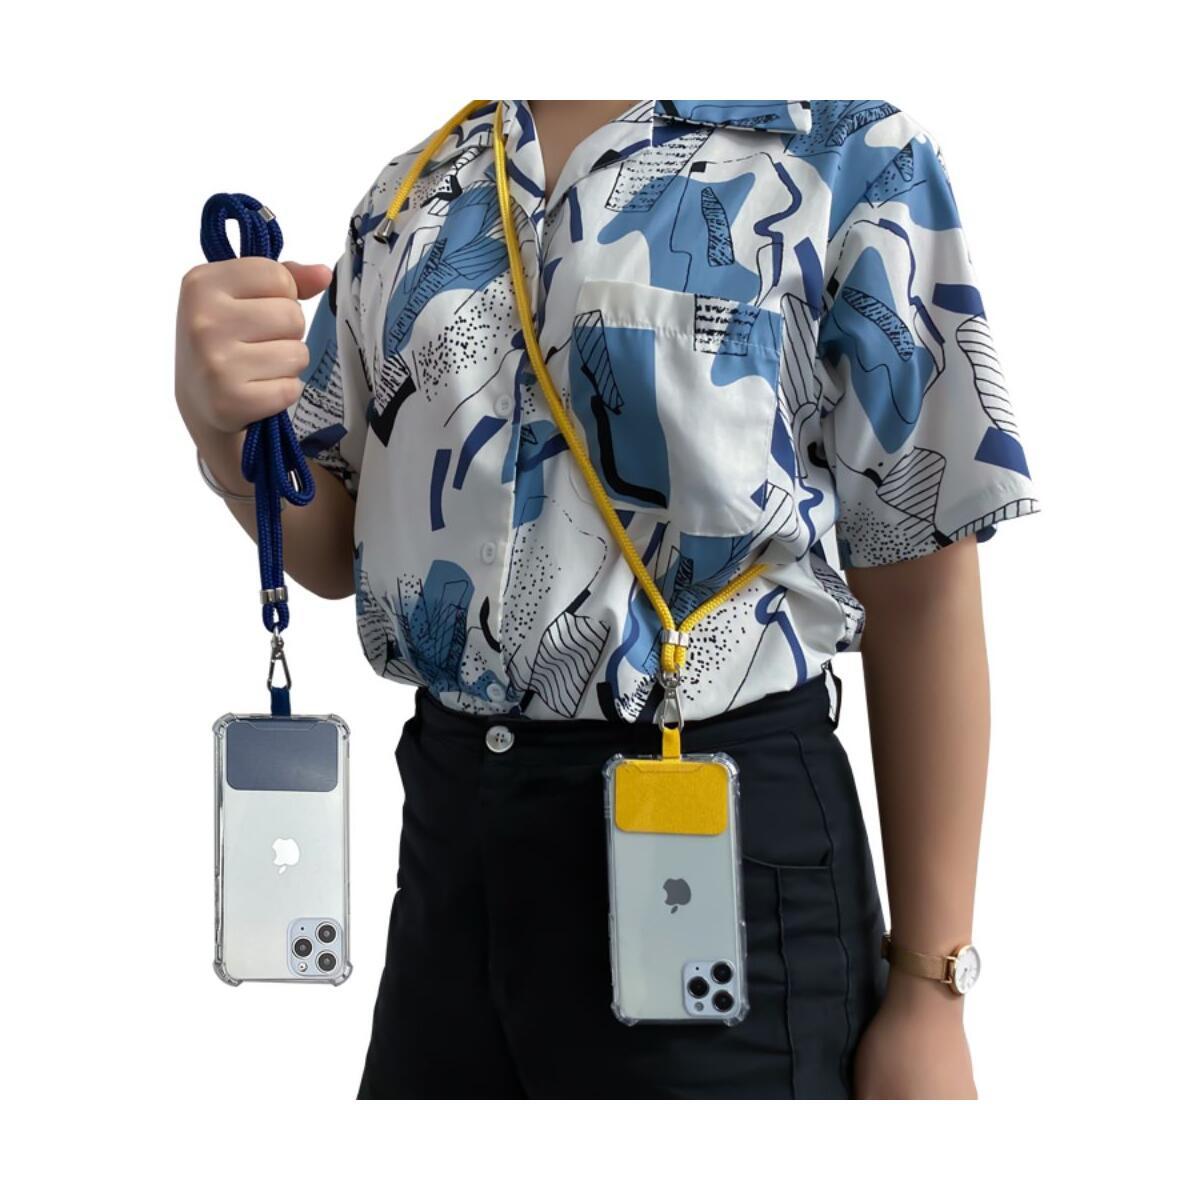 Phone Lanyard, Universal Cell Phone Lanyard with Adjustable shoulder Strap, lanyard phone case, high quality Multiple use lanyard